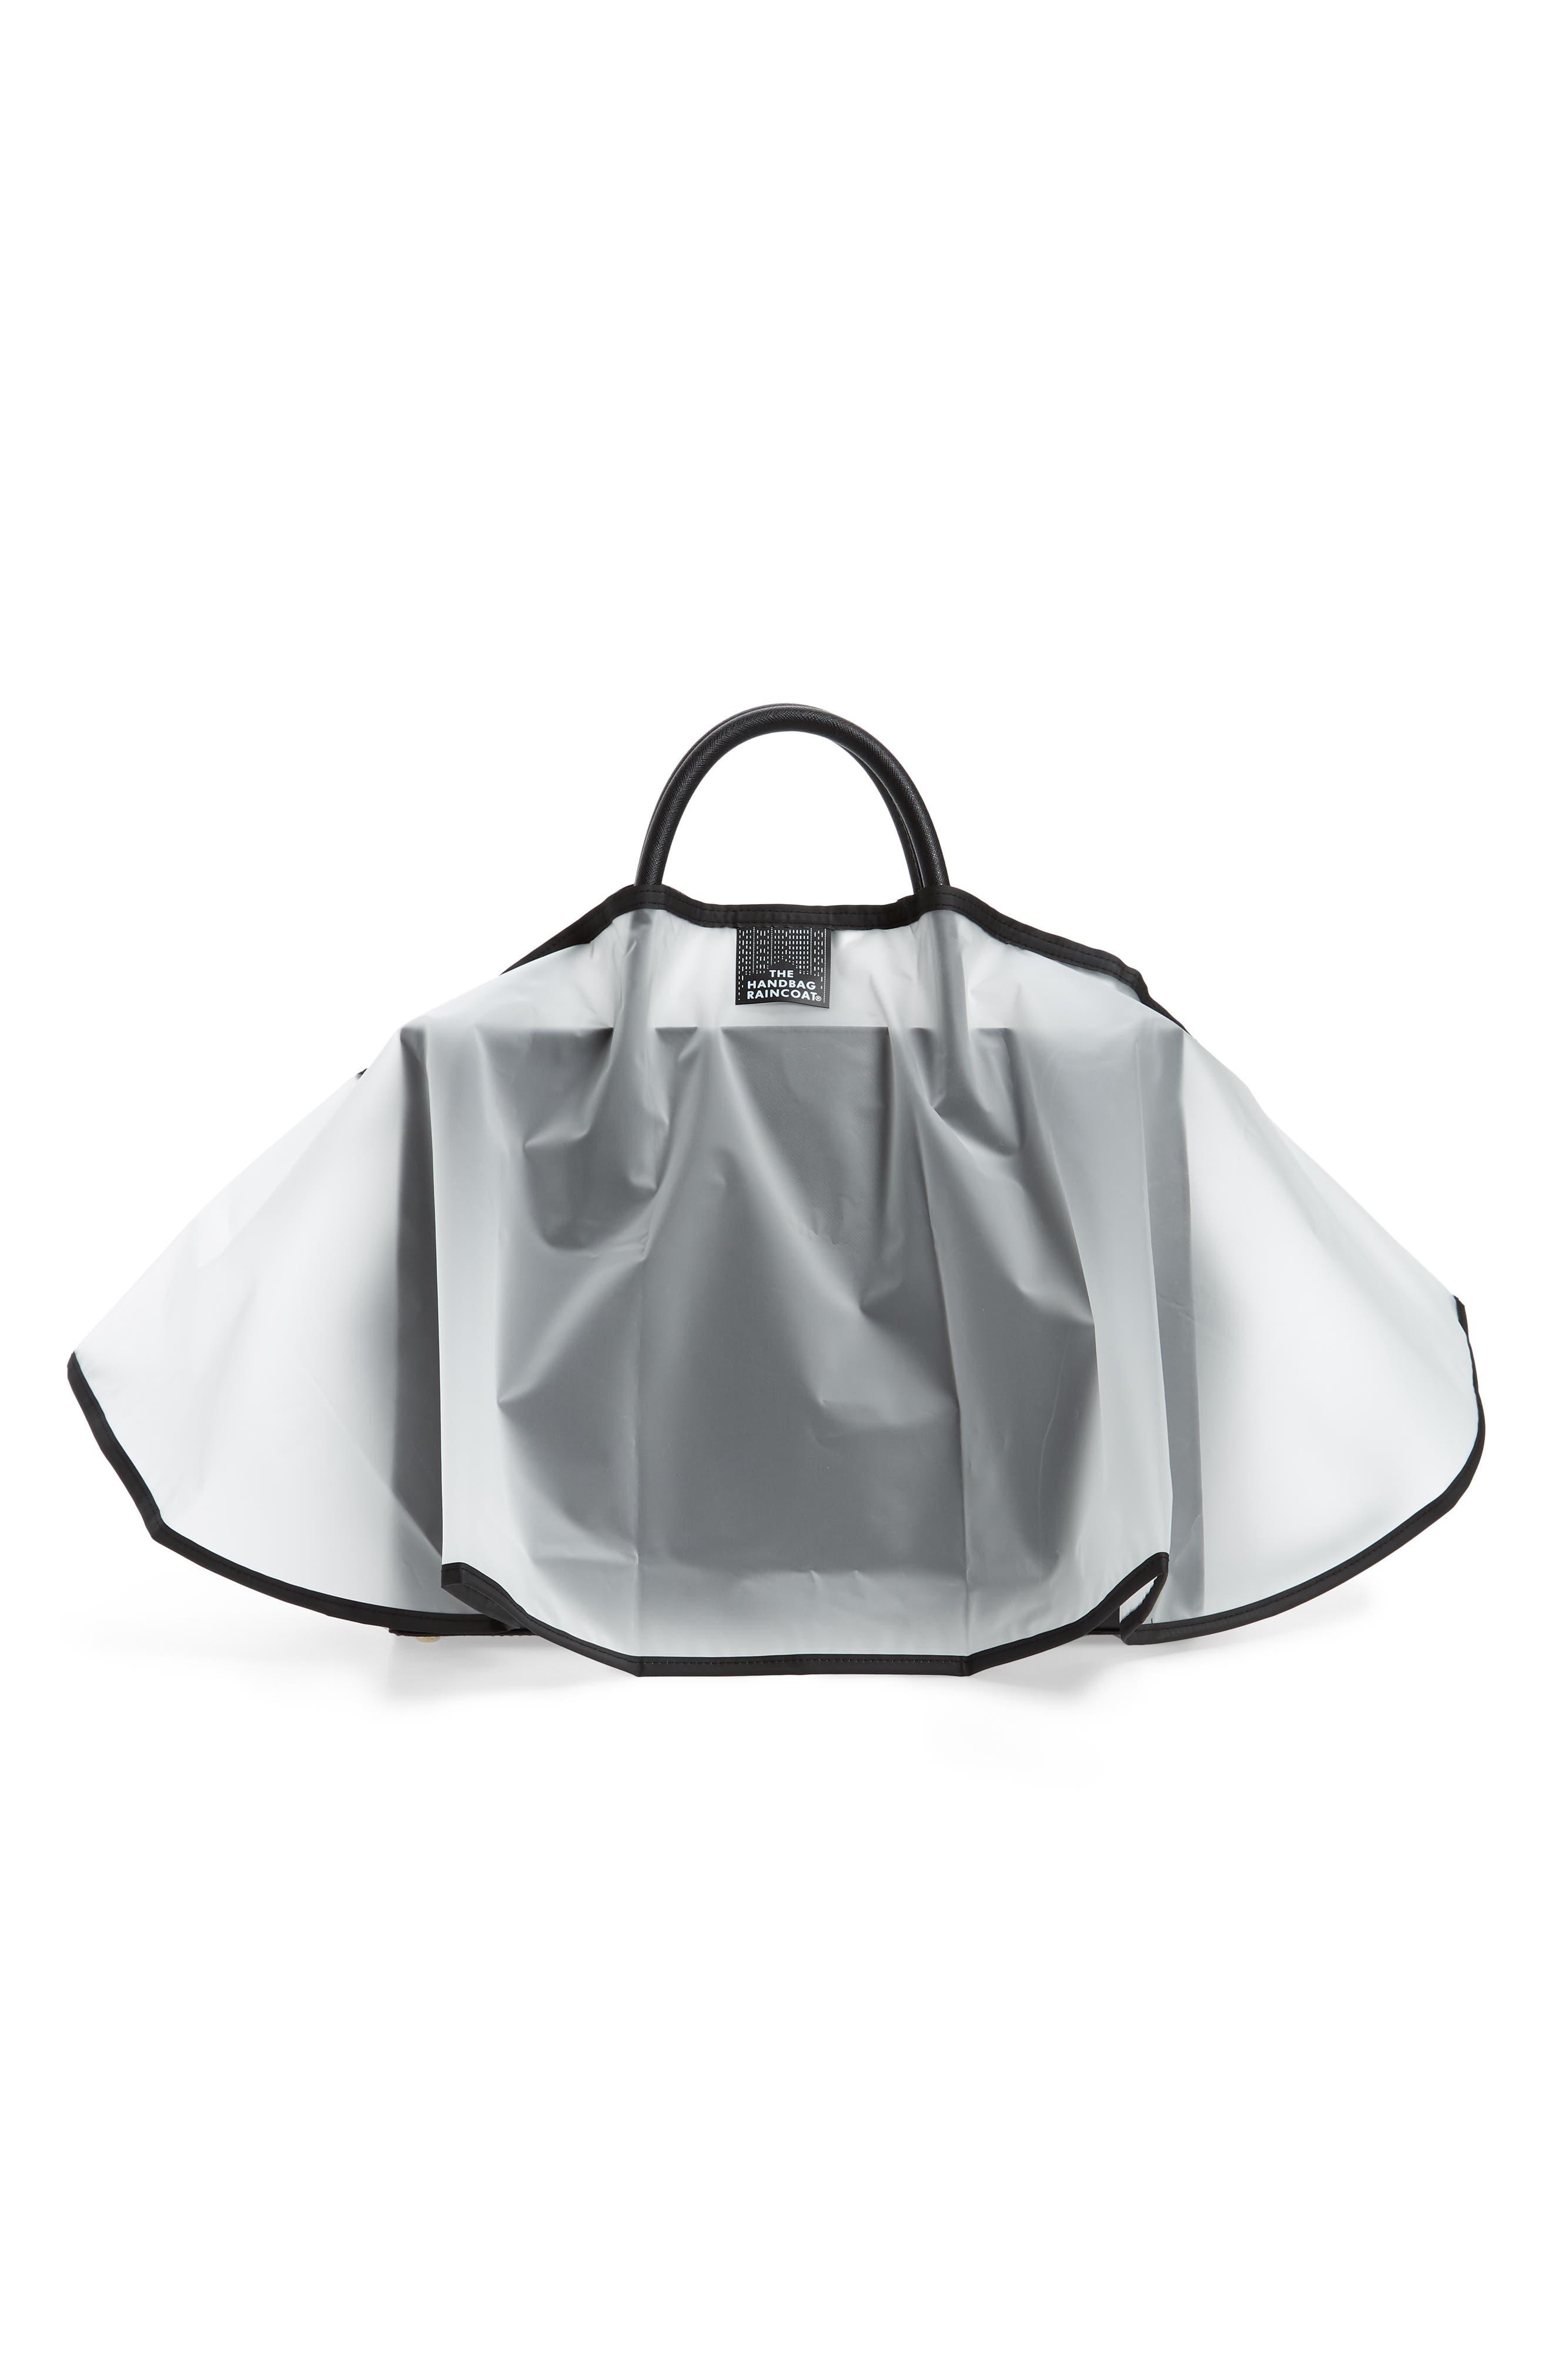 Midi Clear Handbag Protector,                             Alternate thumbnail 2, color,                             Clear/ Black